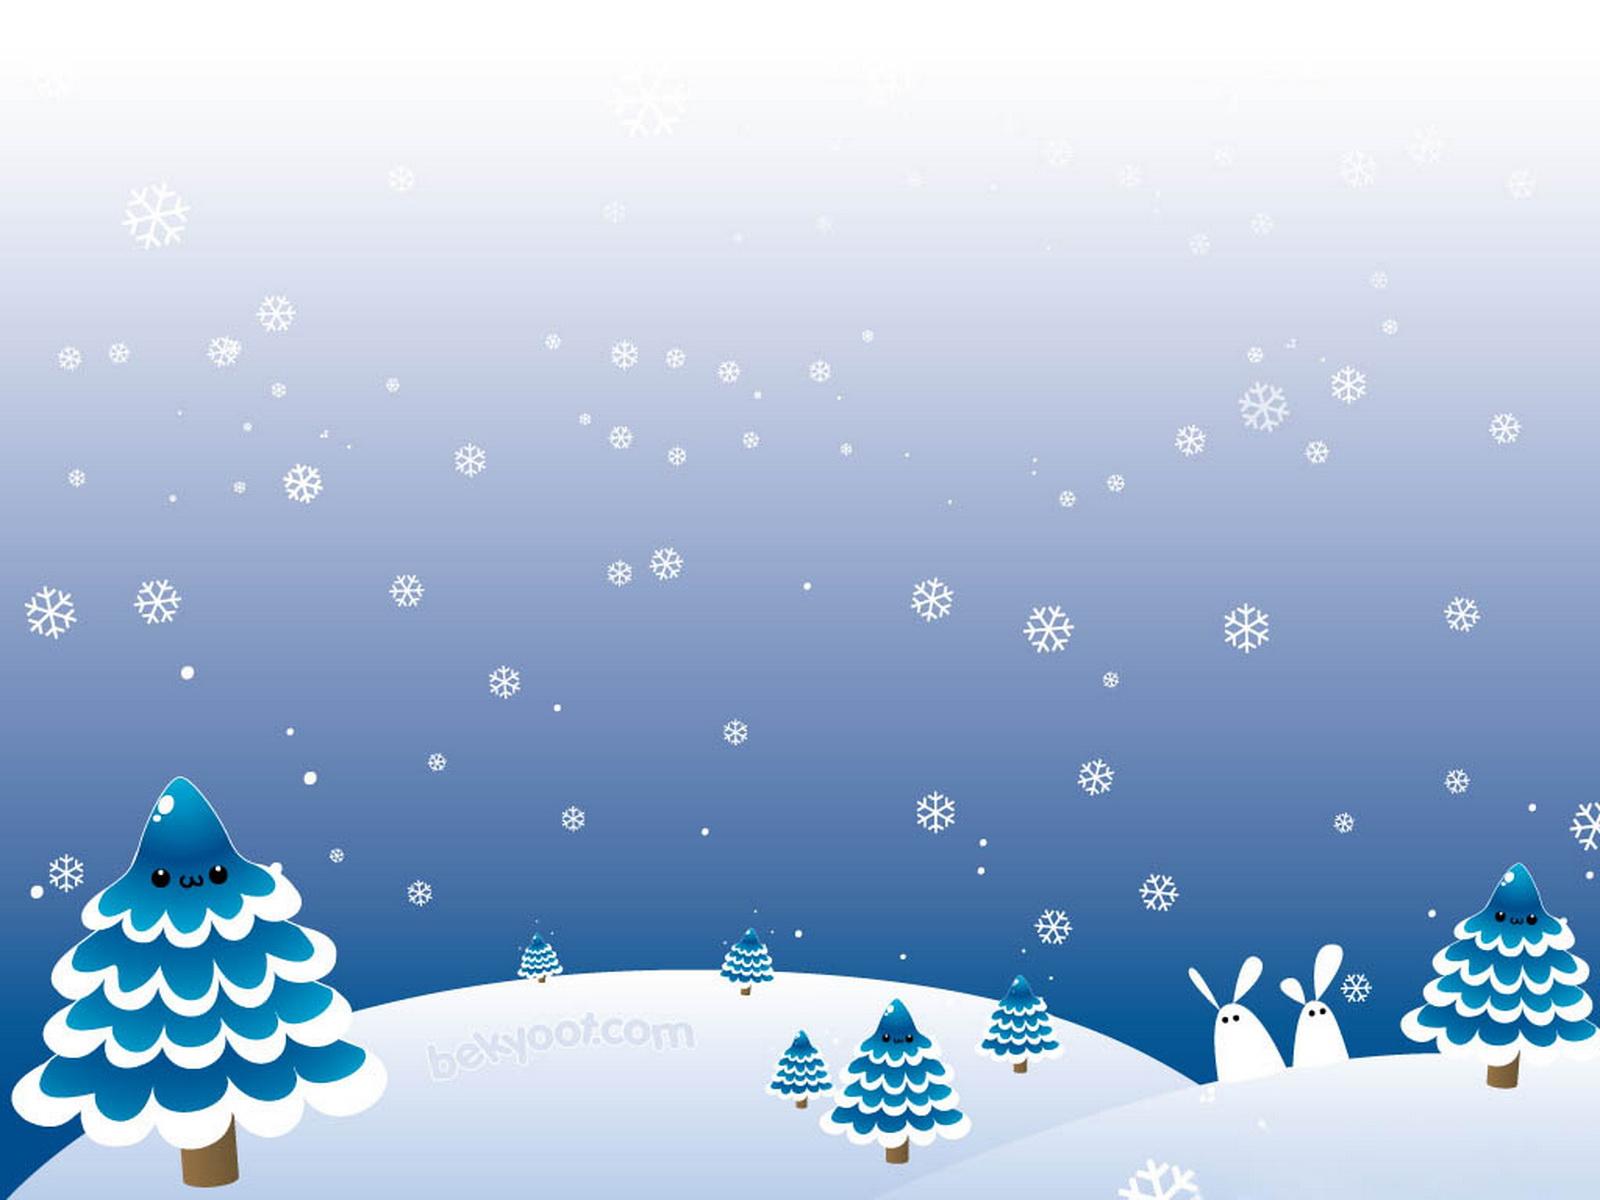 Snow Falling Desktop Wallpaper Winter Holiday Wallpapers Pixelstalk Net